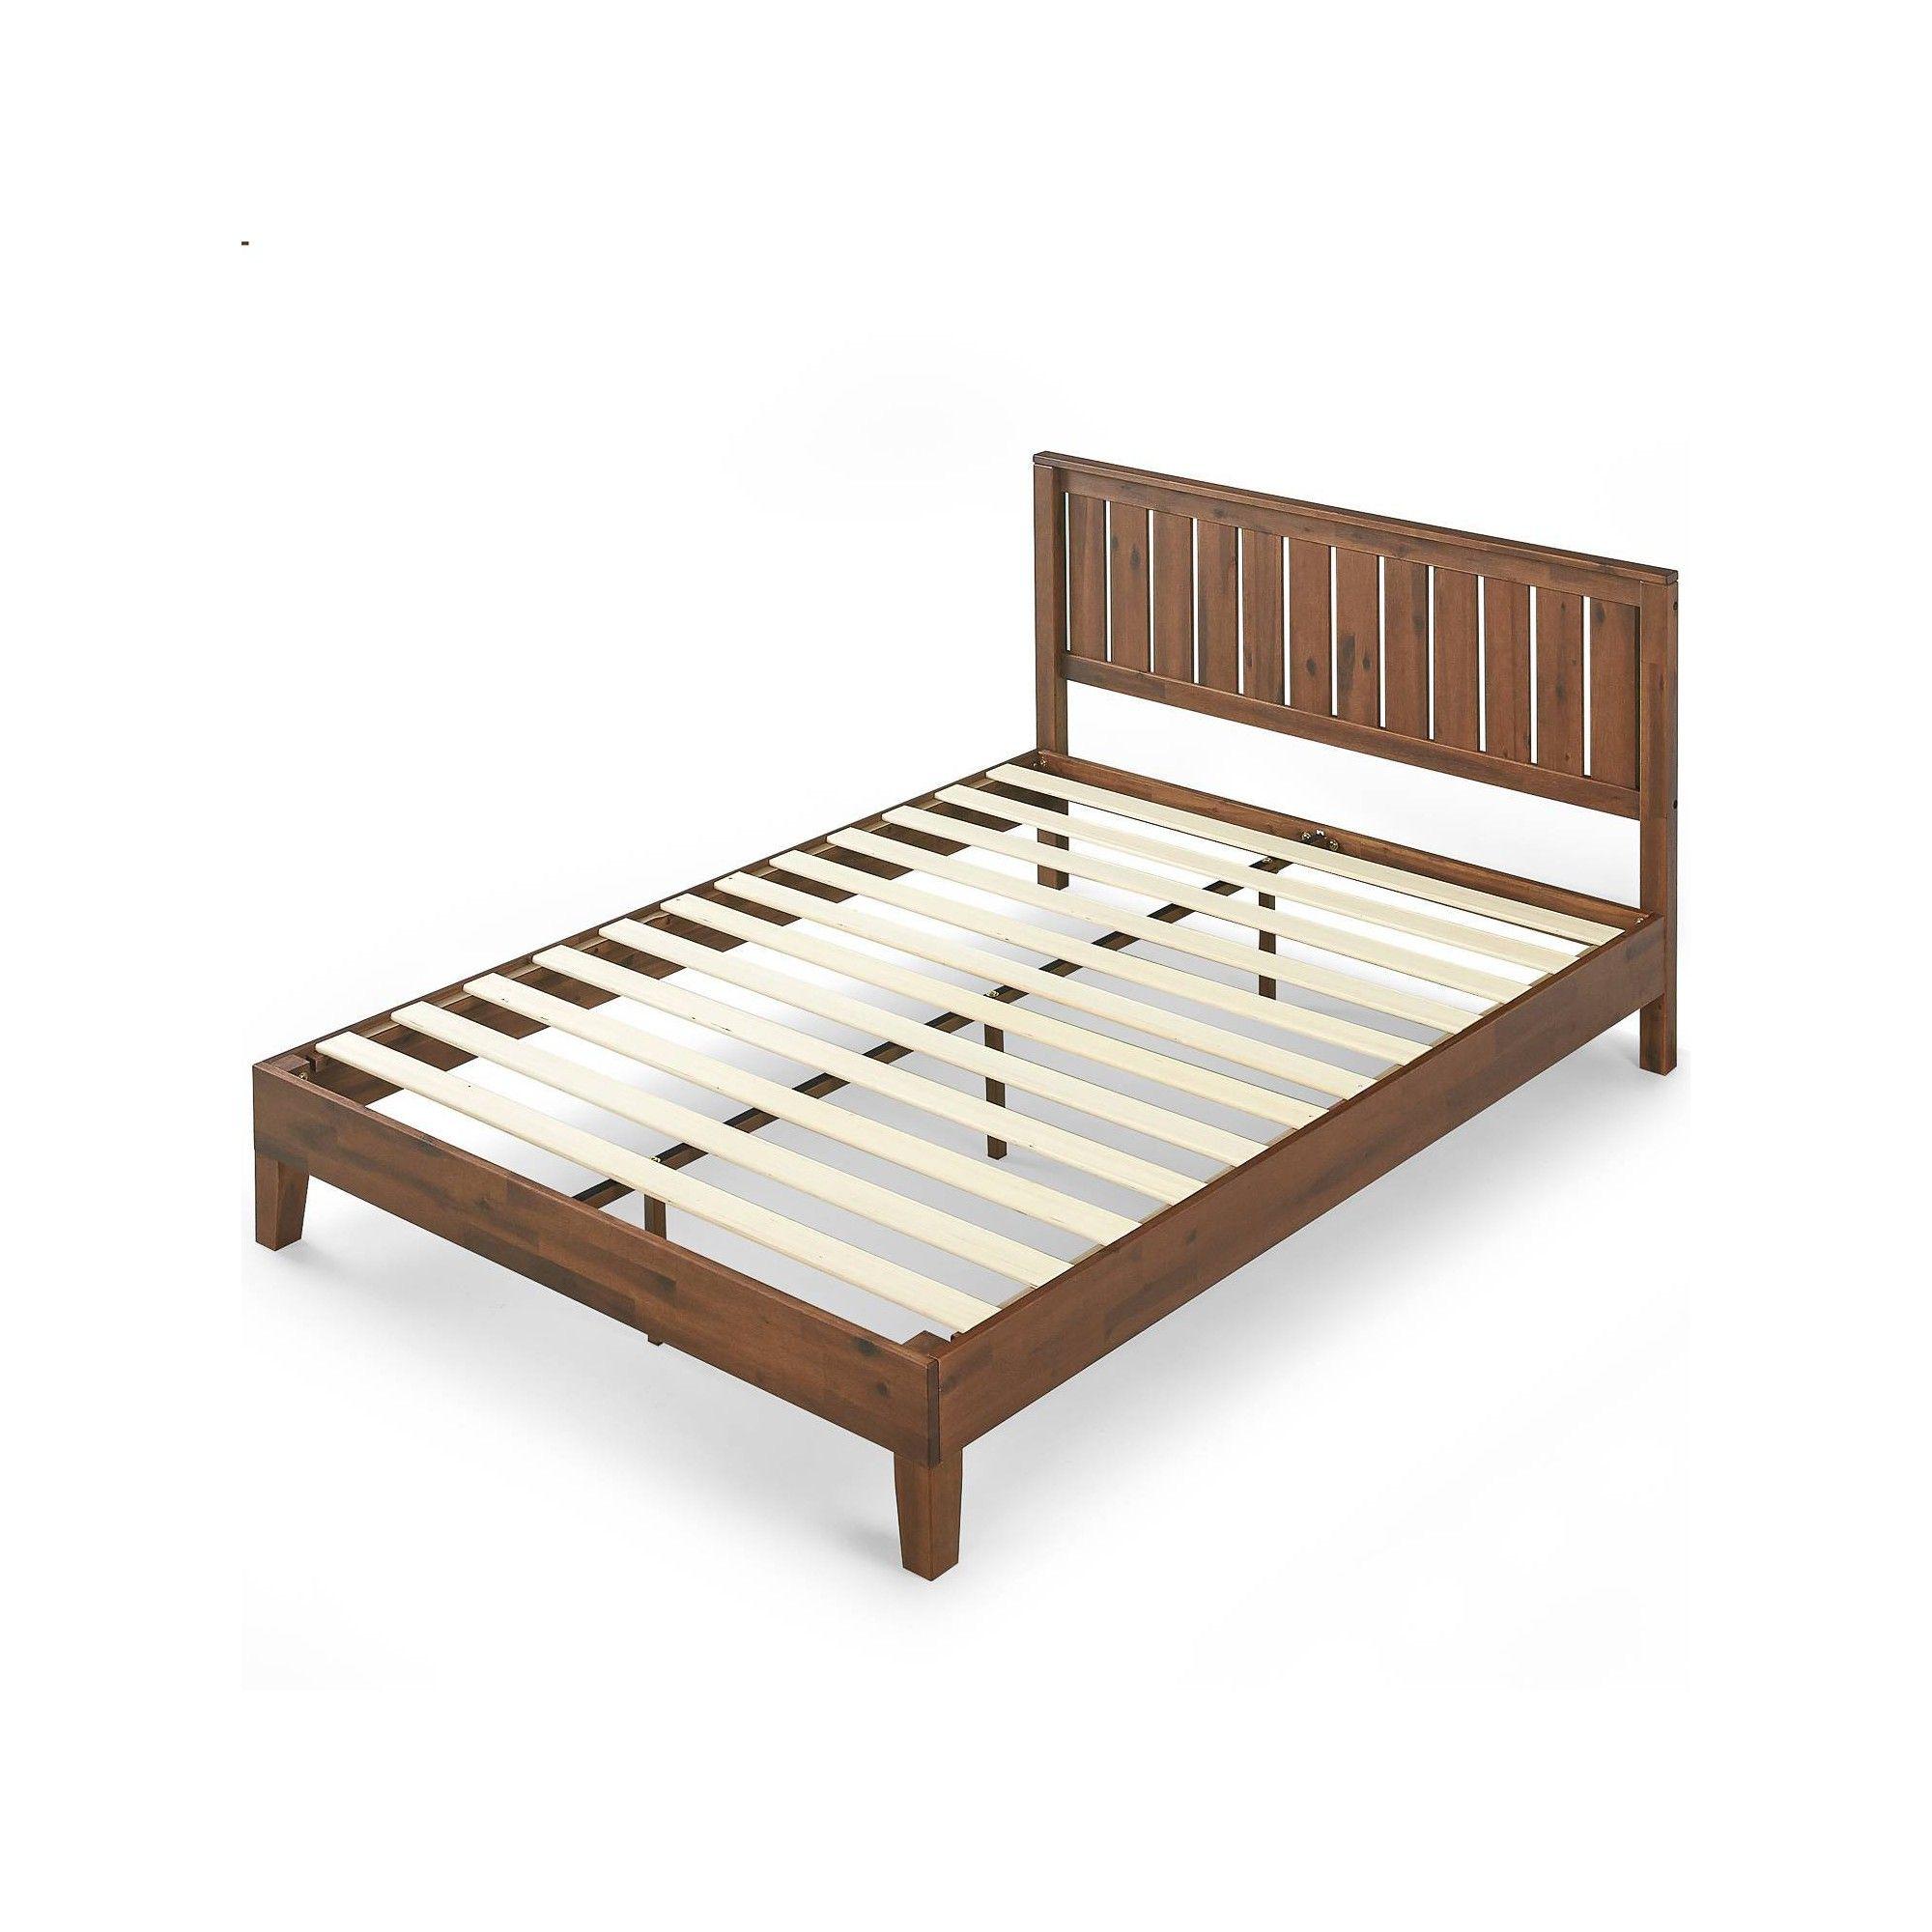 King Vivek Deluxe Wood Platform Bed With Headboard Antique Wood Zinus Headboards For Beds Wood Platform Bed